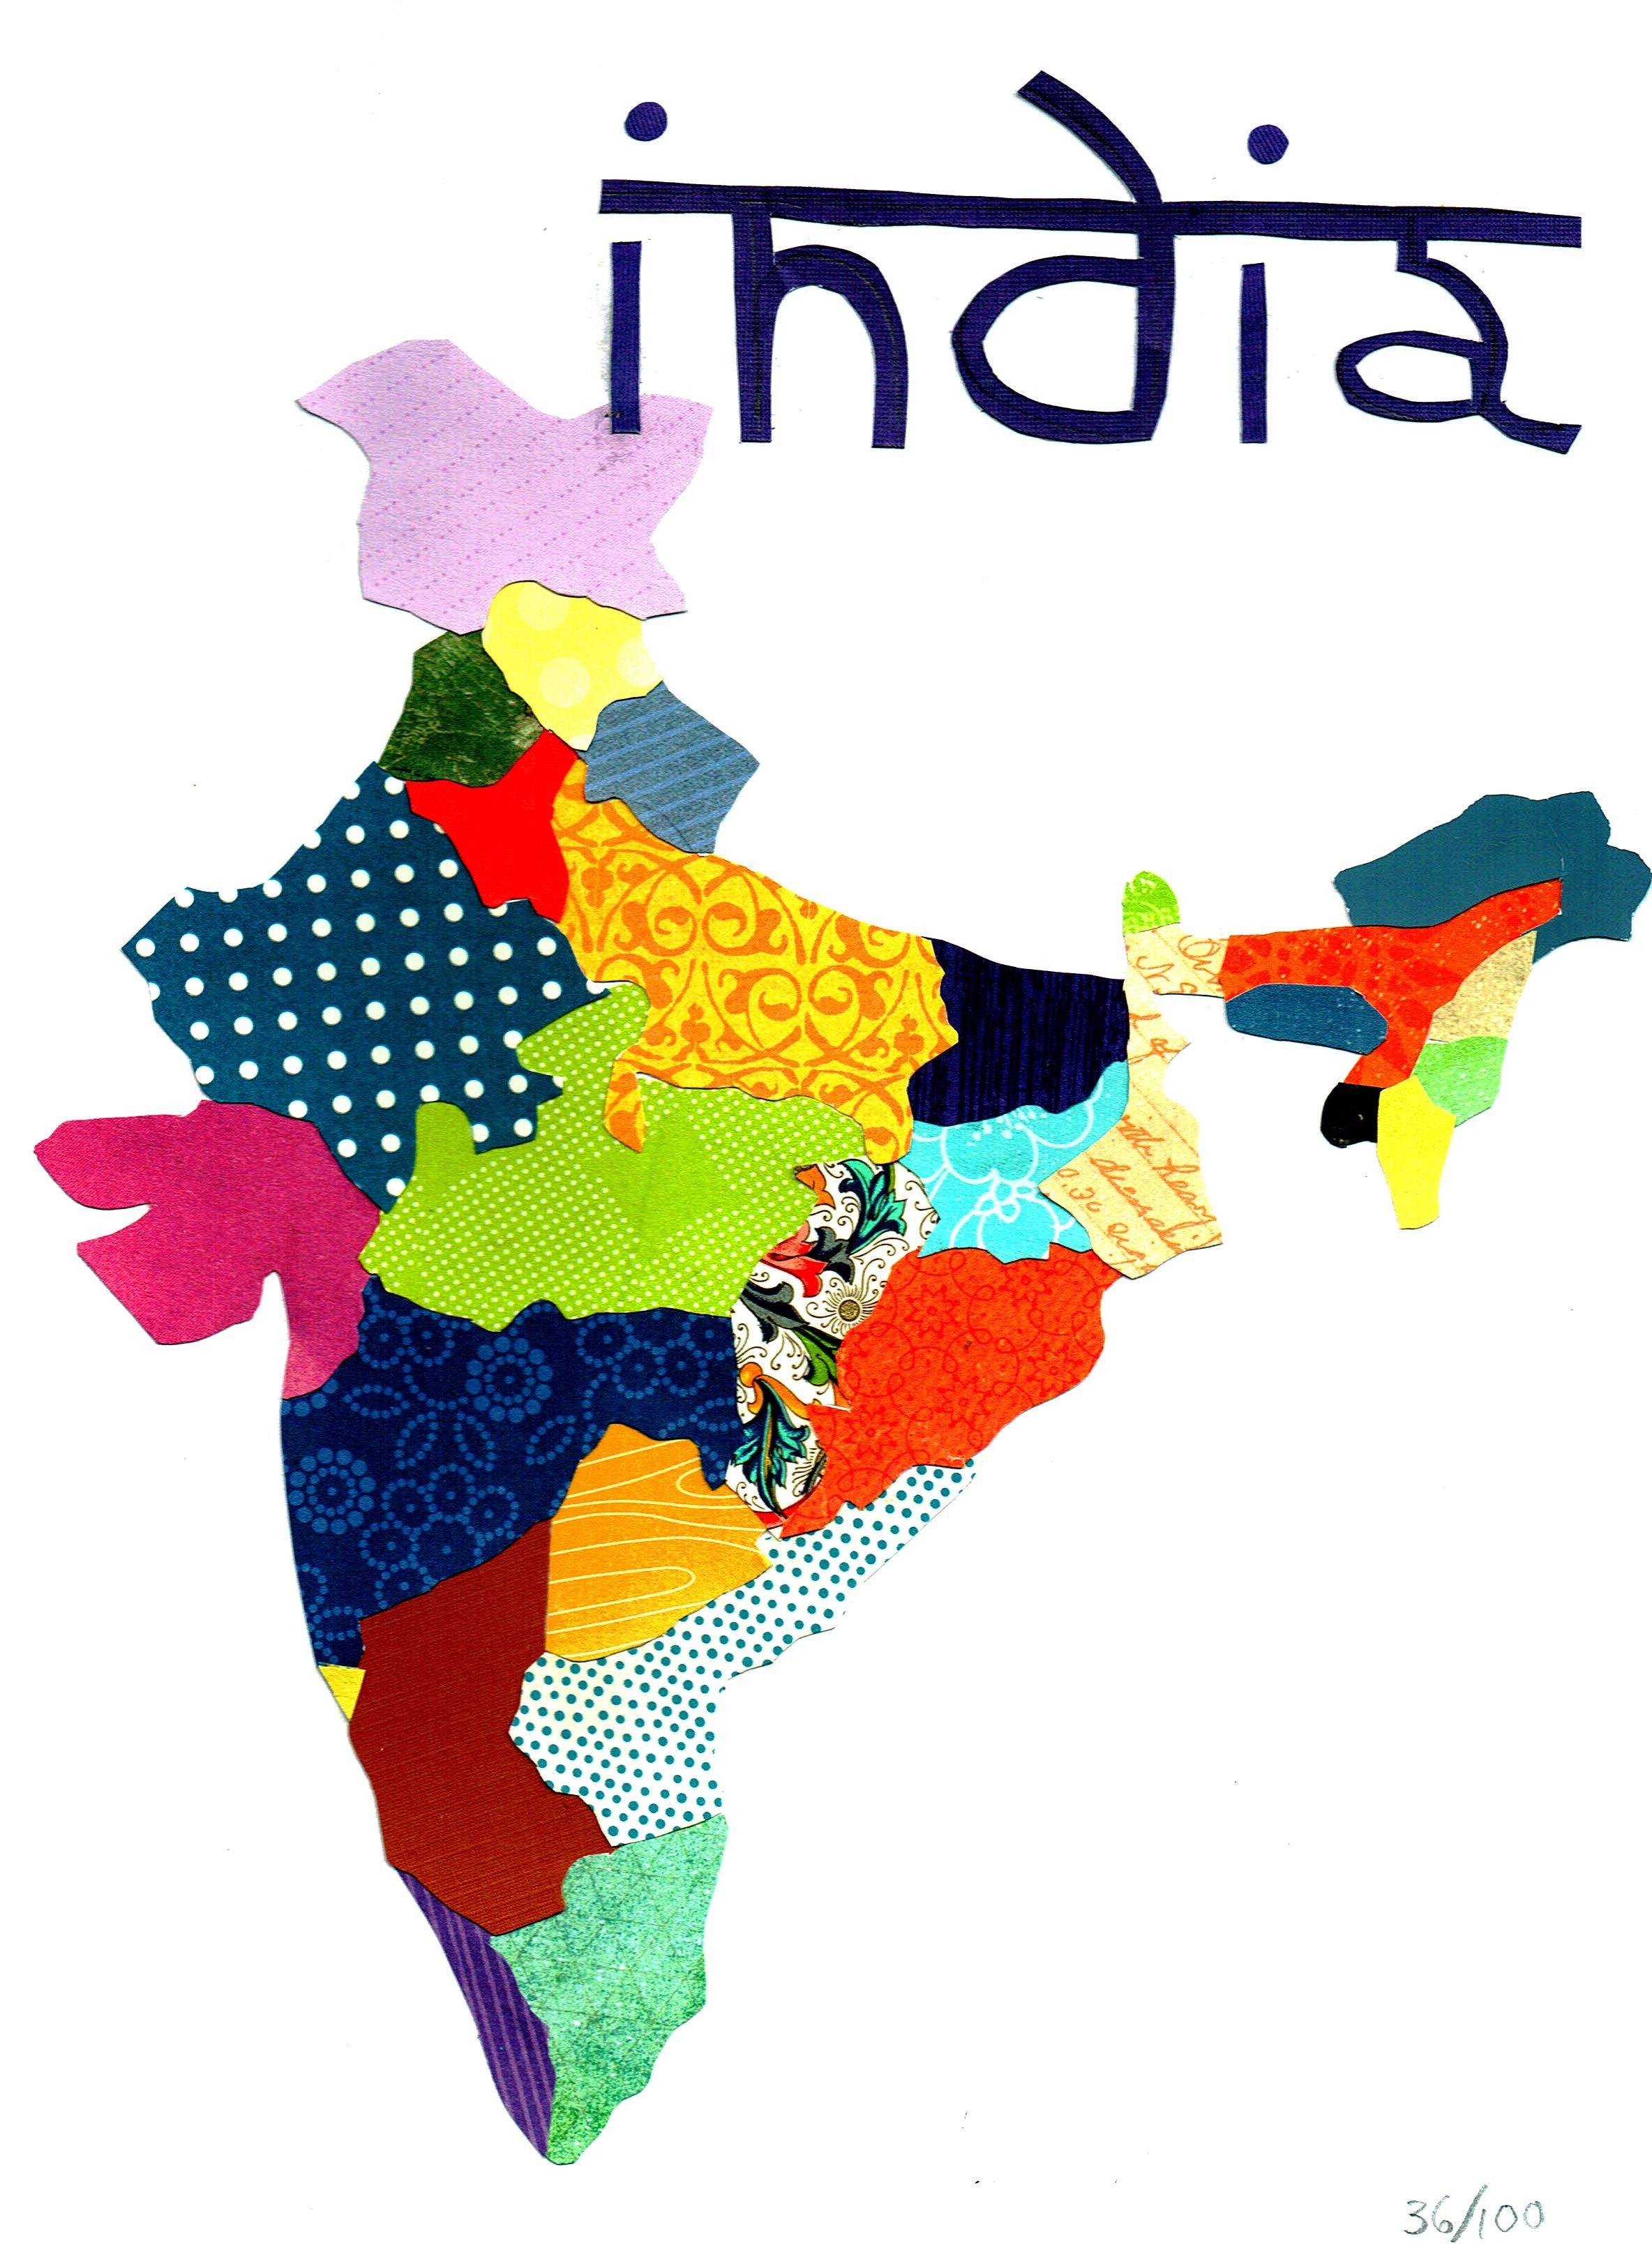 Day 36 - India